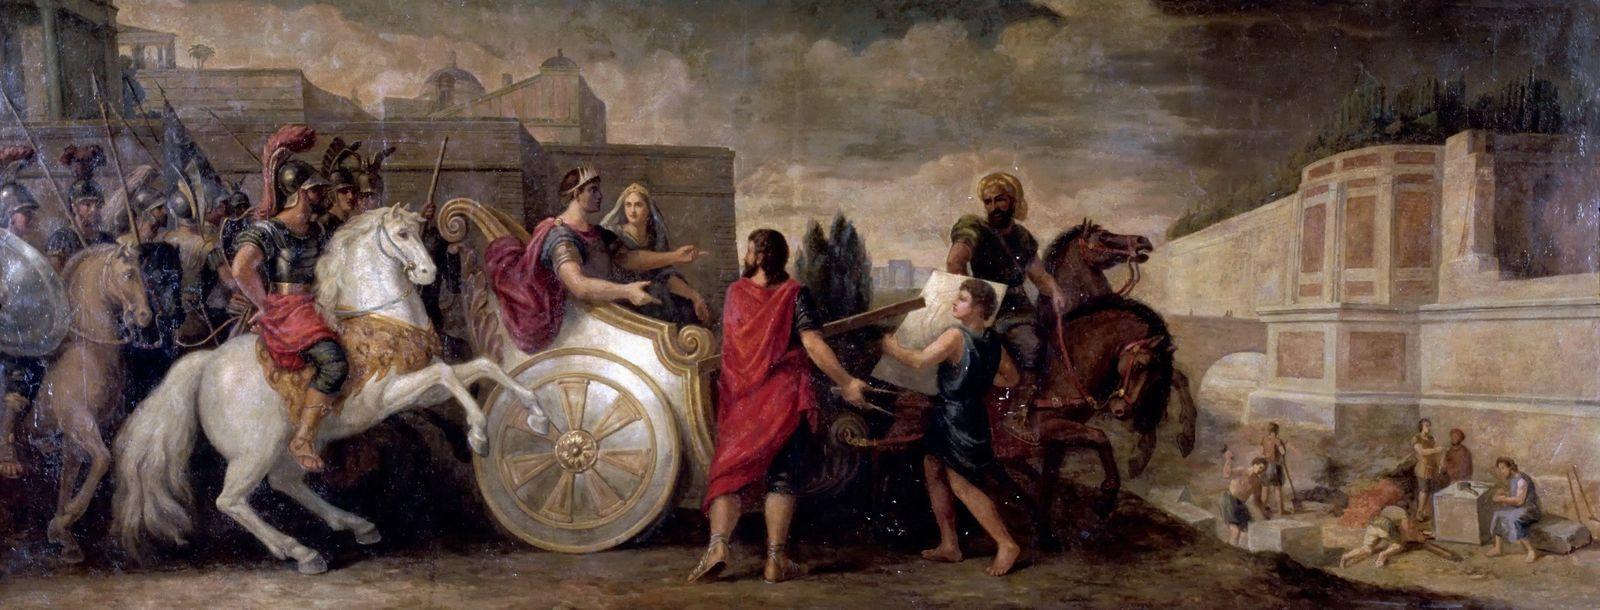 Nabuchodonosor, le despote réformateur